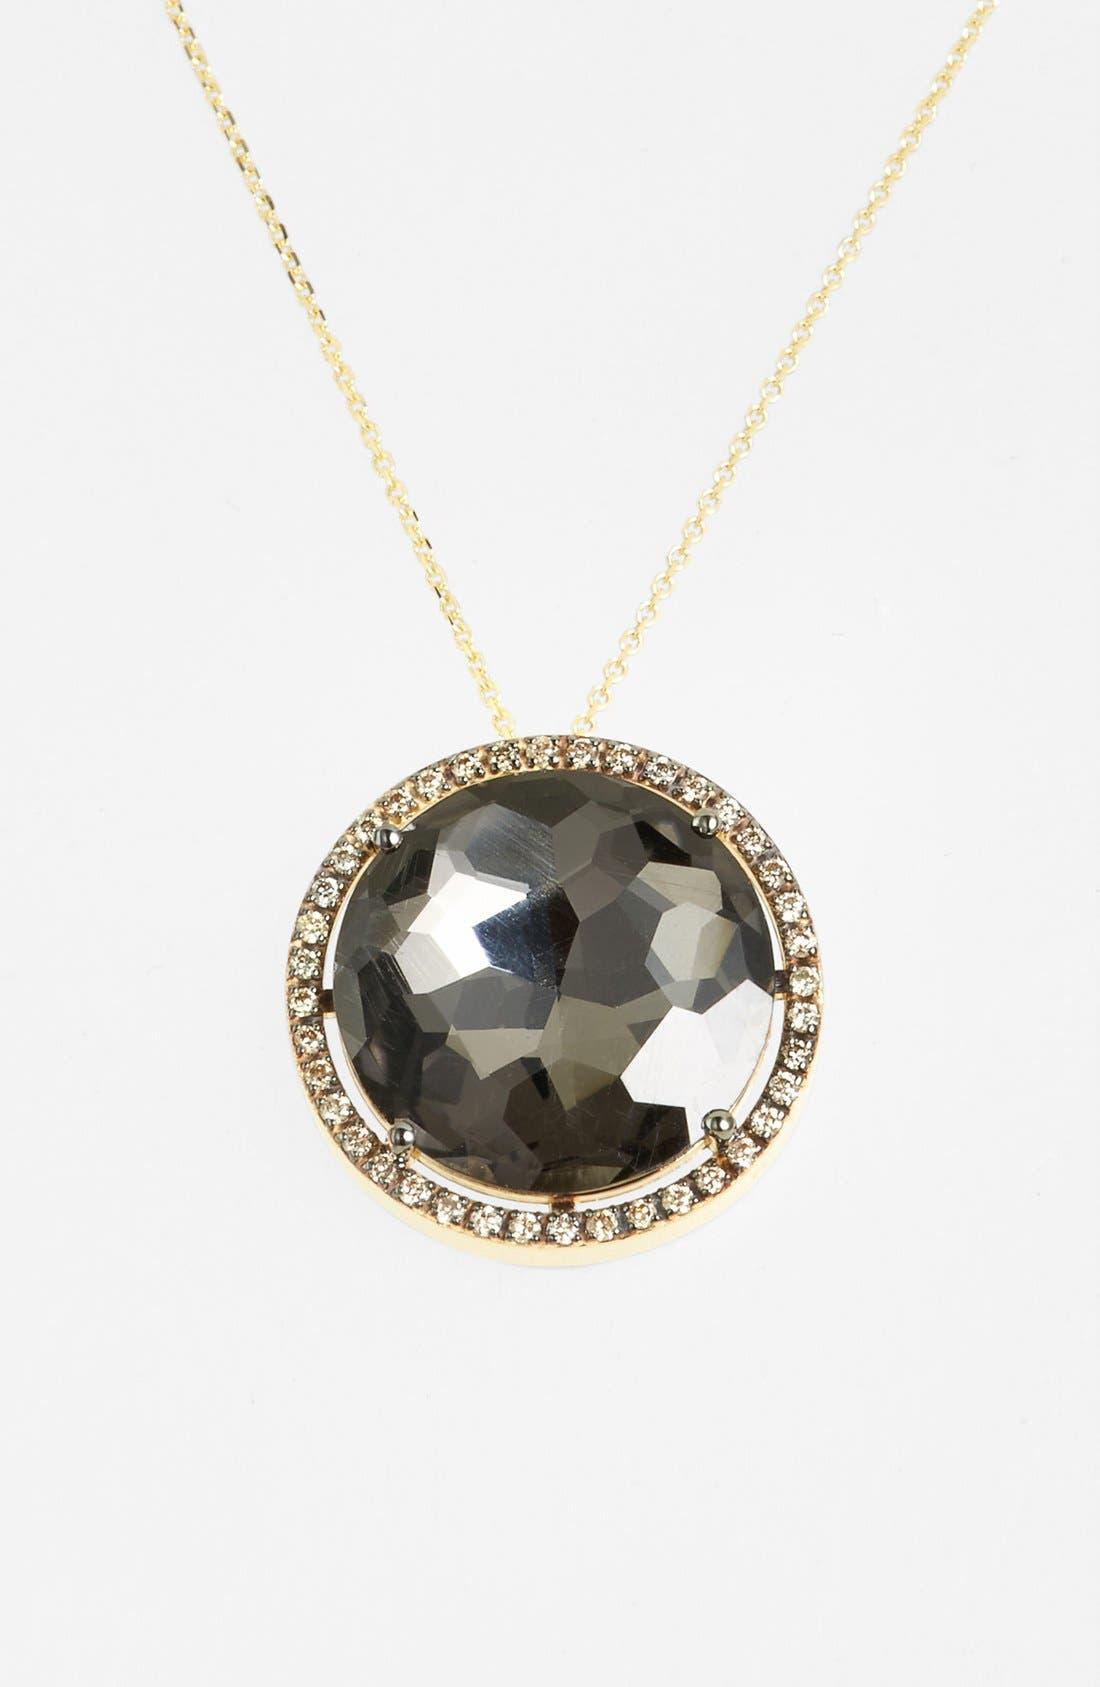 KALAN by Suzanne Kalan Diamond & Stone Pendant Necklace,                             Main thumbnail 1, color,                             YELLOW GOLD/ BLACK QUARTZ